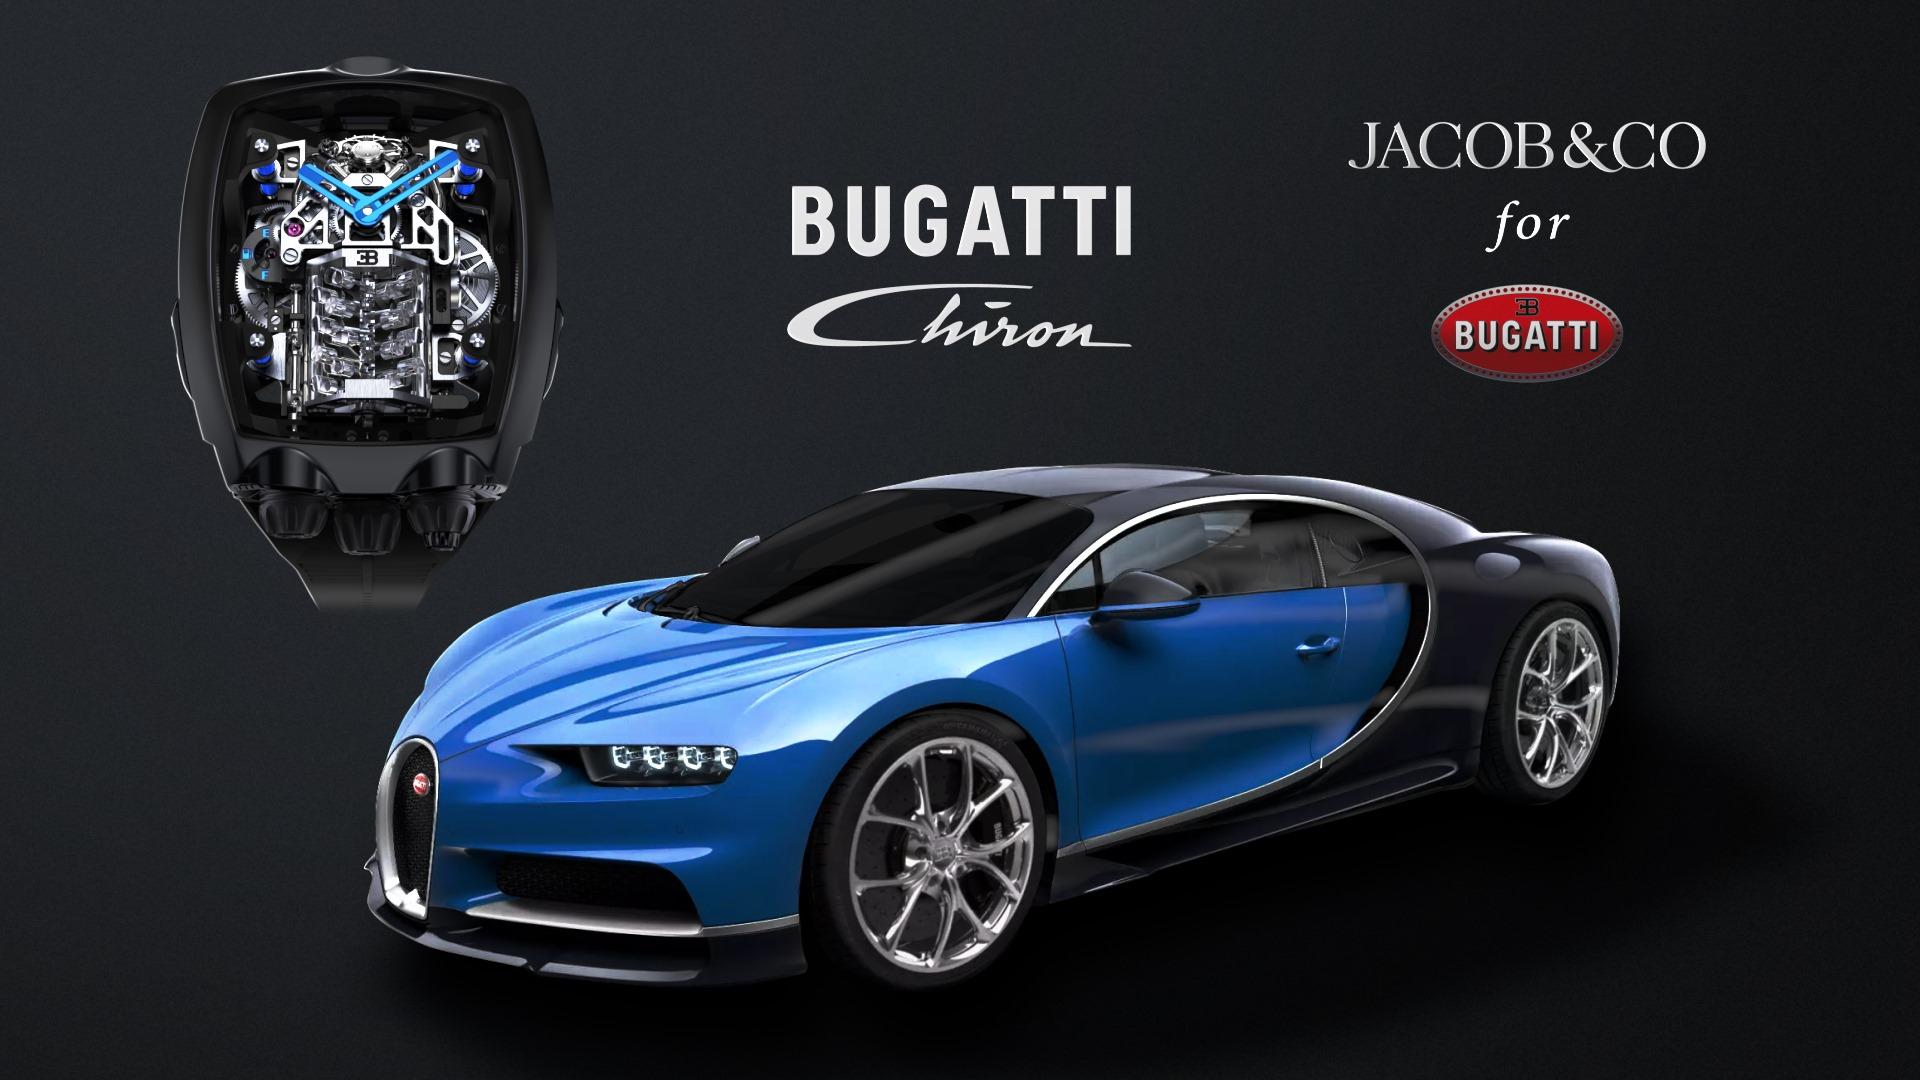 Jacob-Co-Bugatti-Chiron-Tourbillon-1